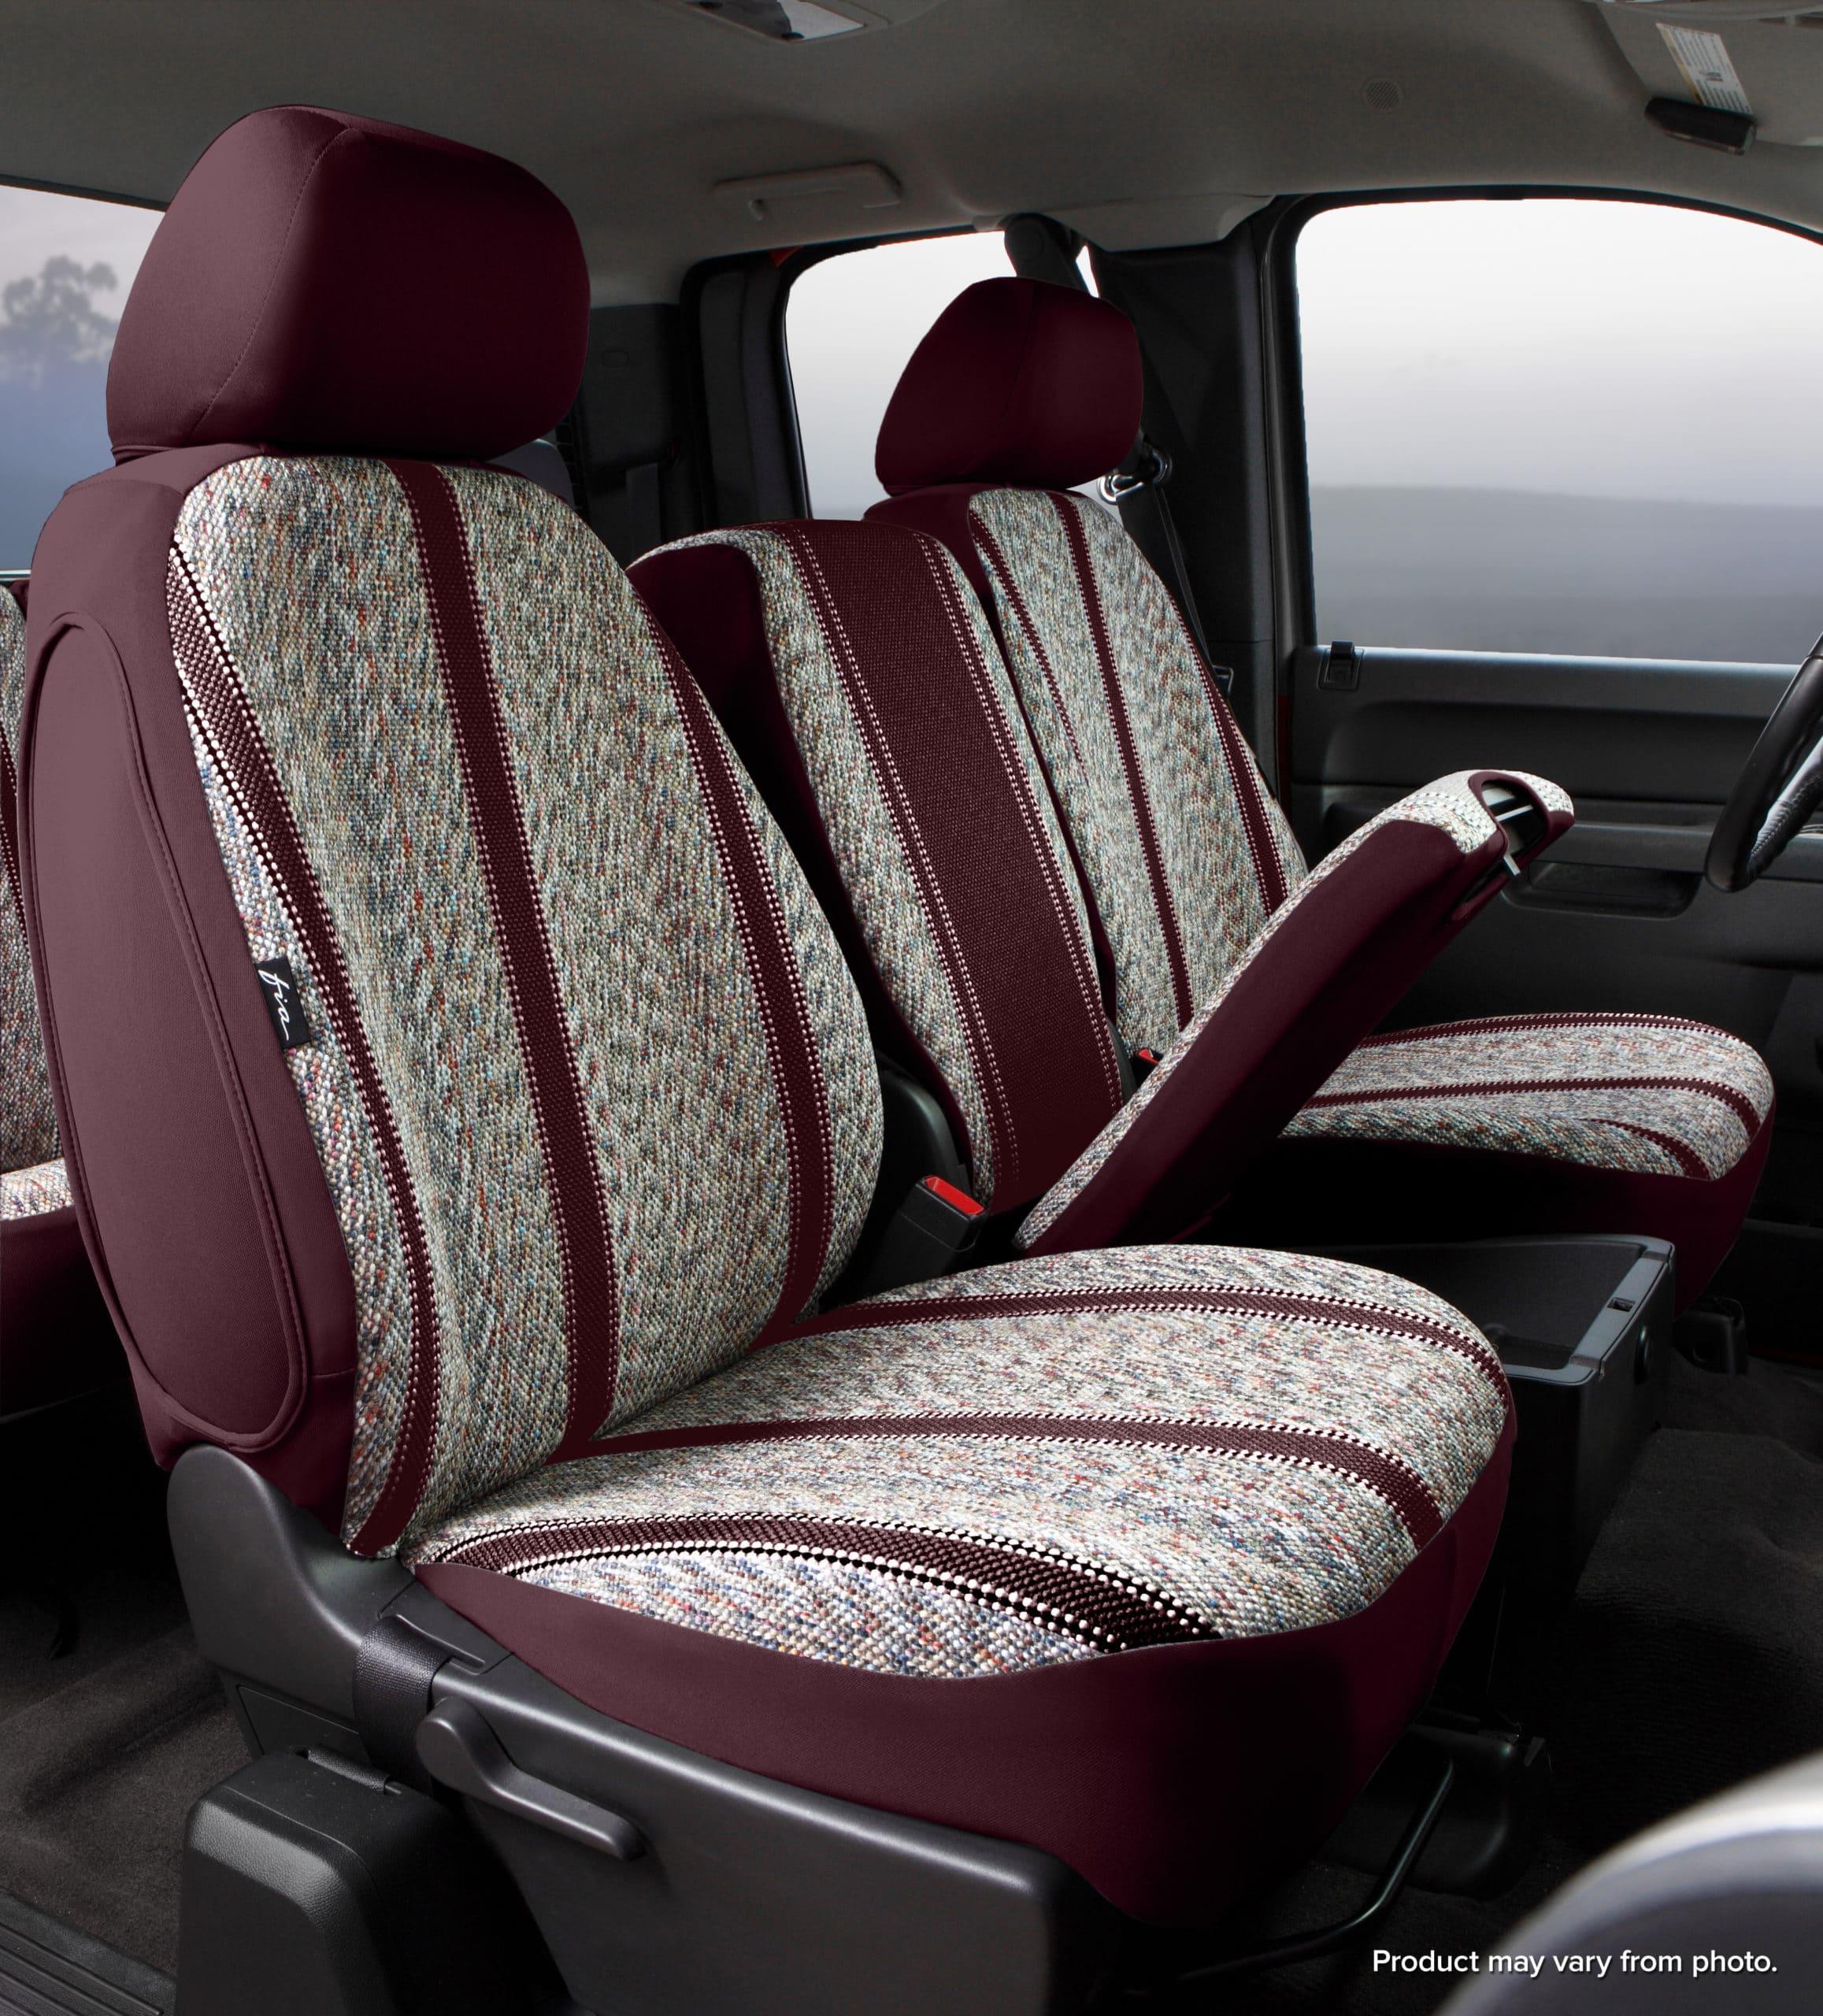 Fia Original Wrangler Seat Covers - Wine - Front Seats